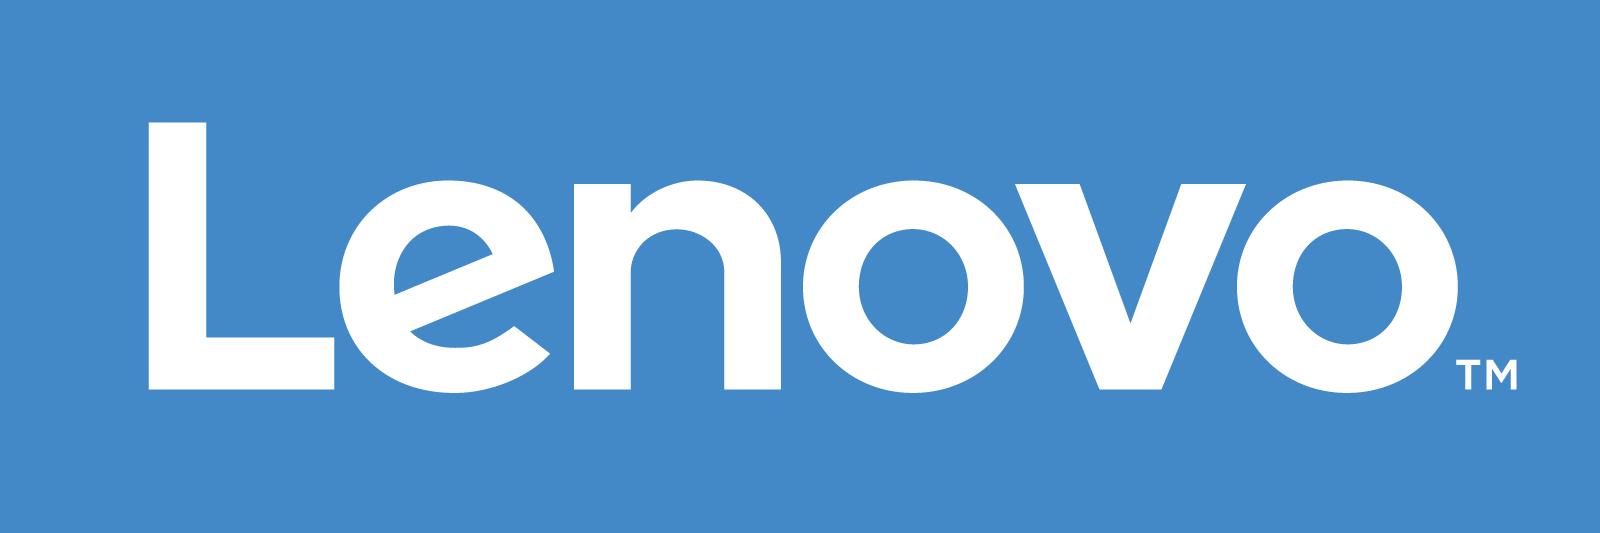 branding_lenovo-logo_lenovologoposdarkblue_high_res.png